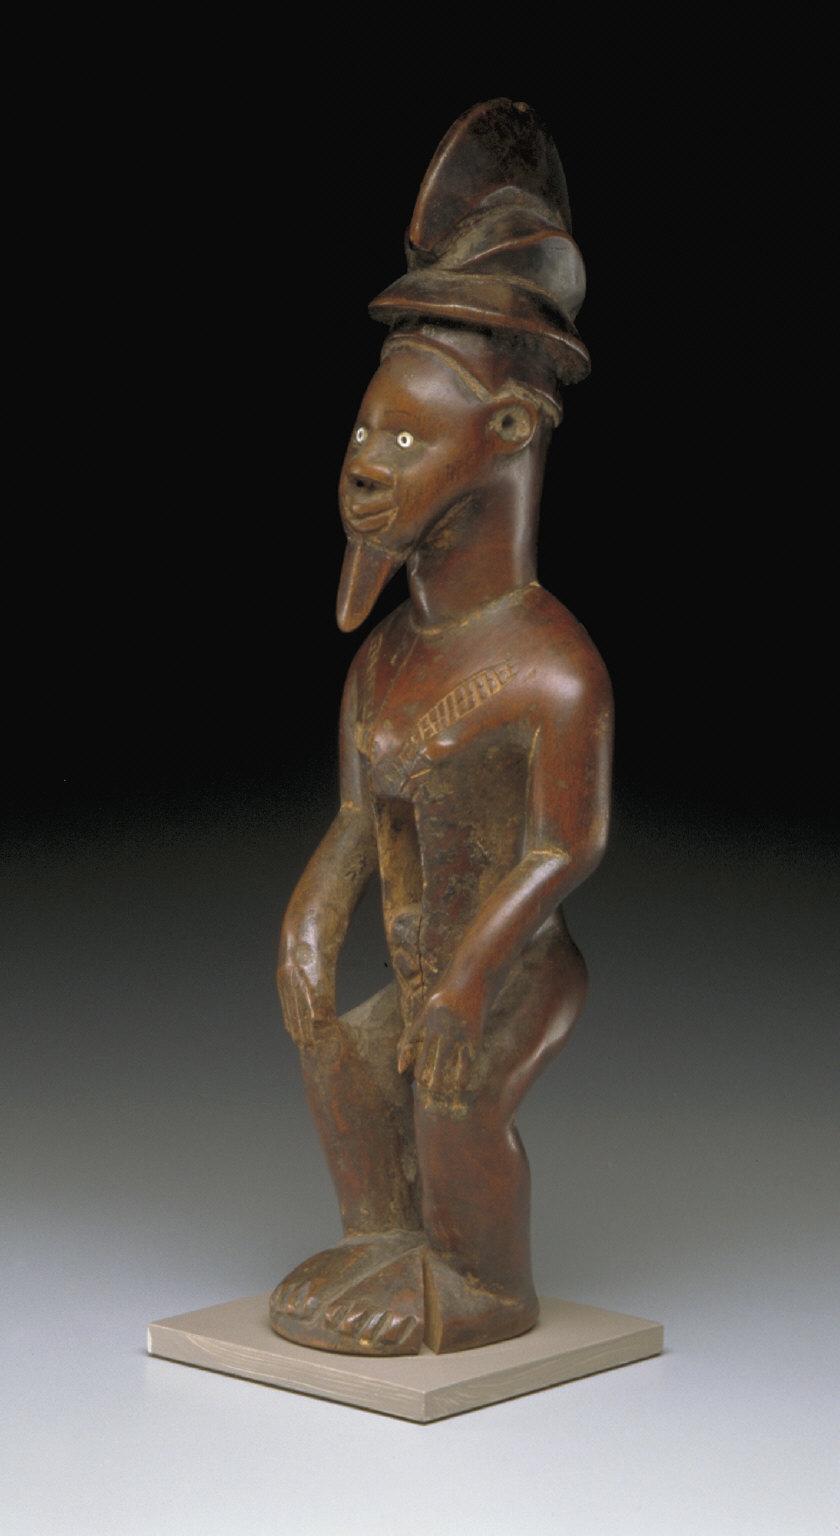 Squatting or Sitting Male Figure